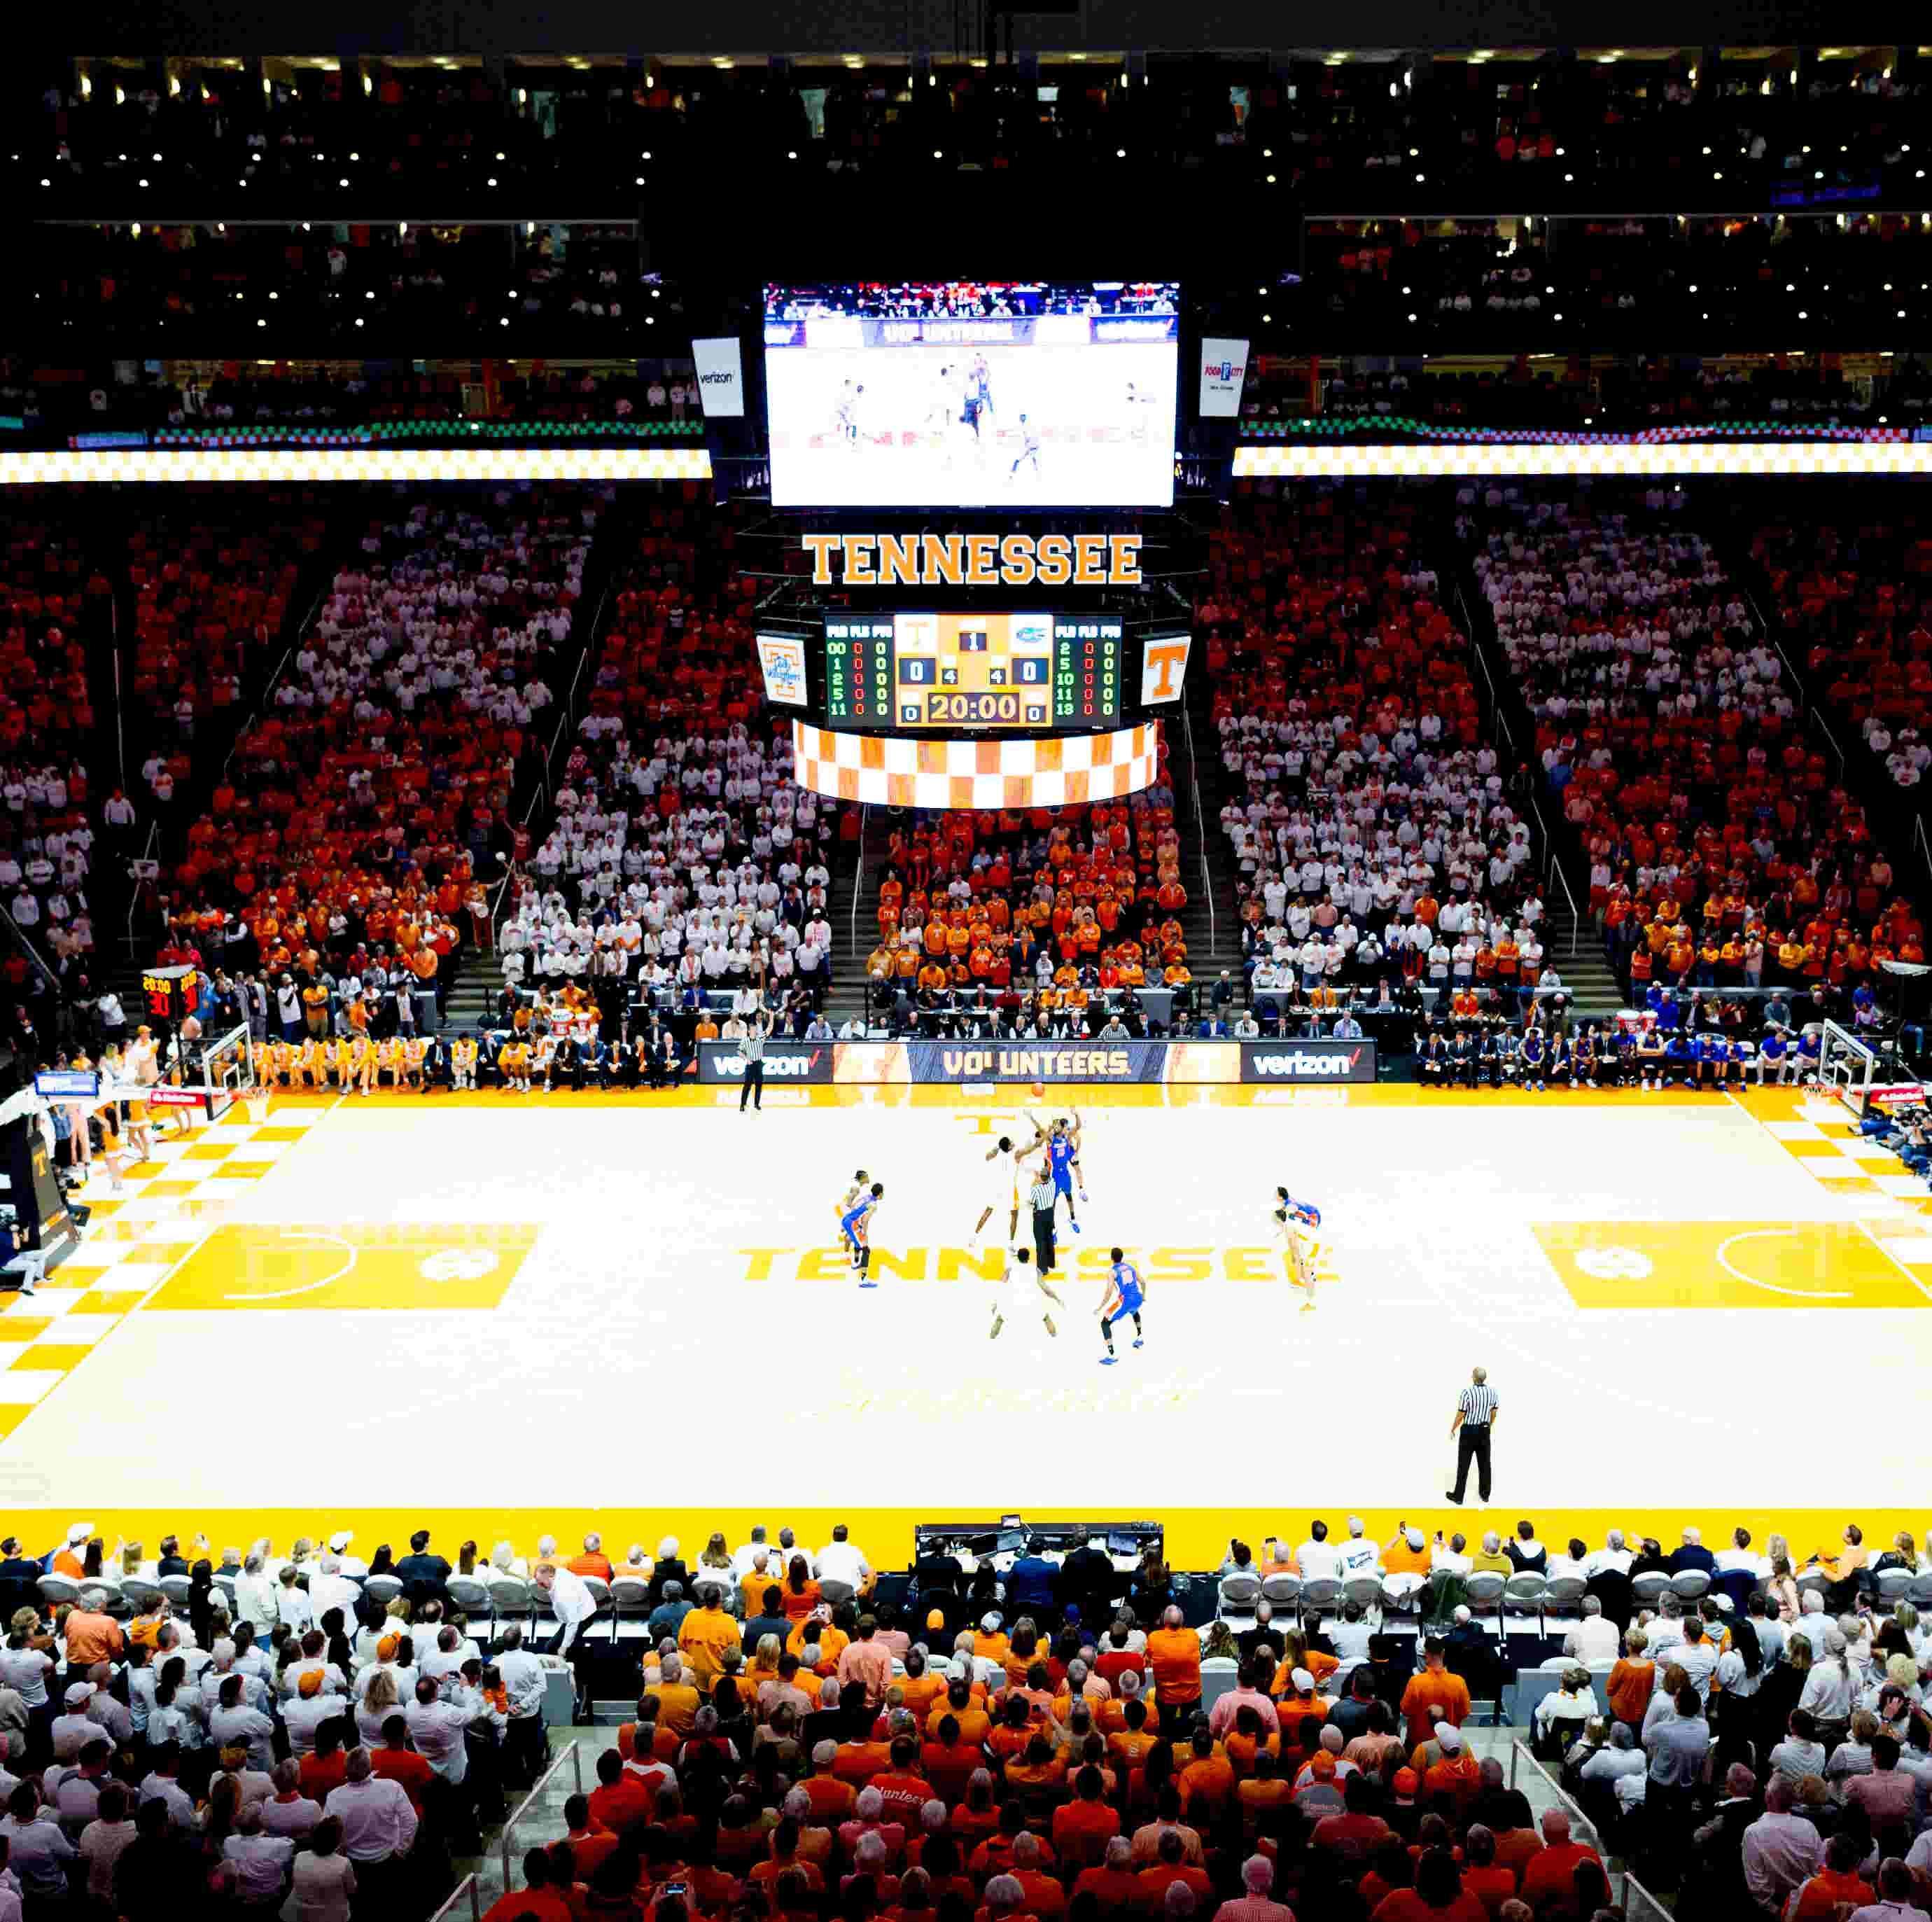 No 1 Ut Vols Basketball Phone App Gives Stunning Pregame